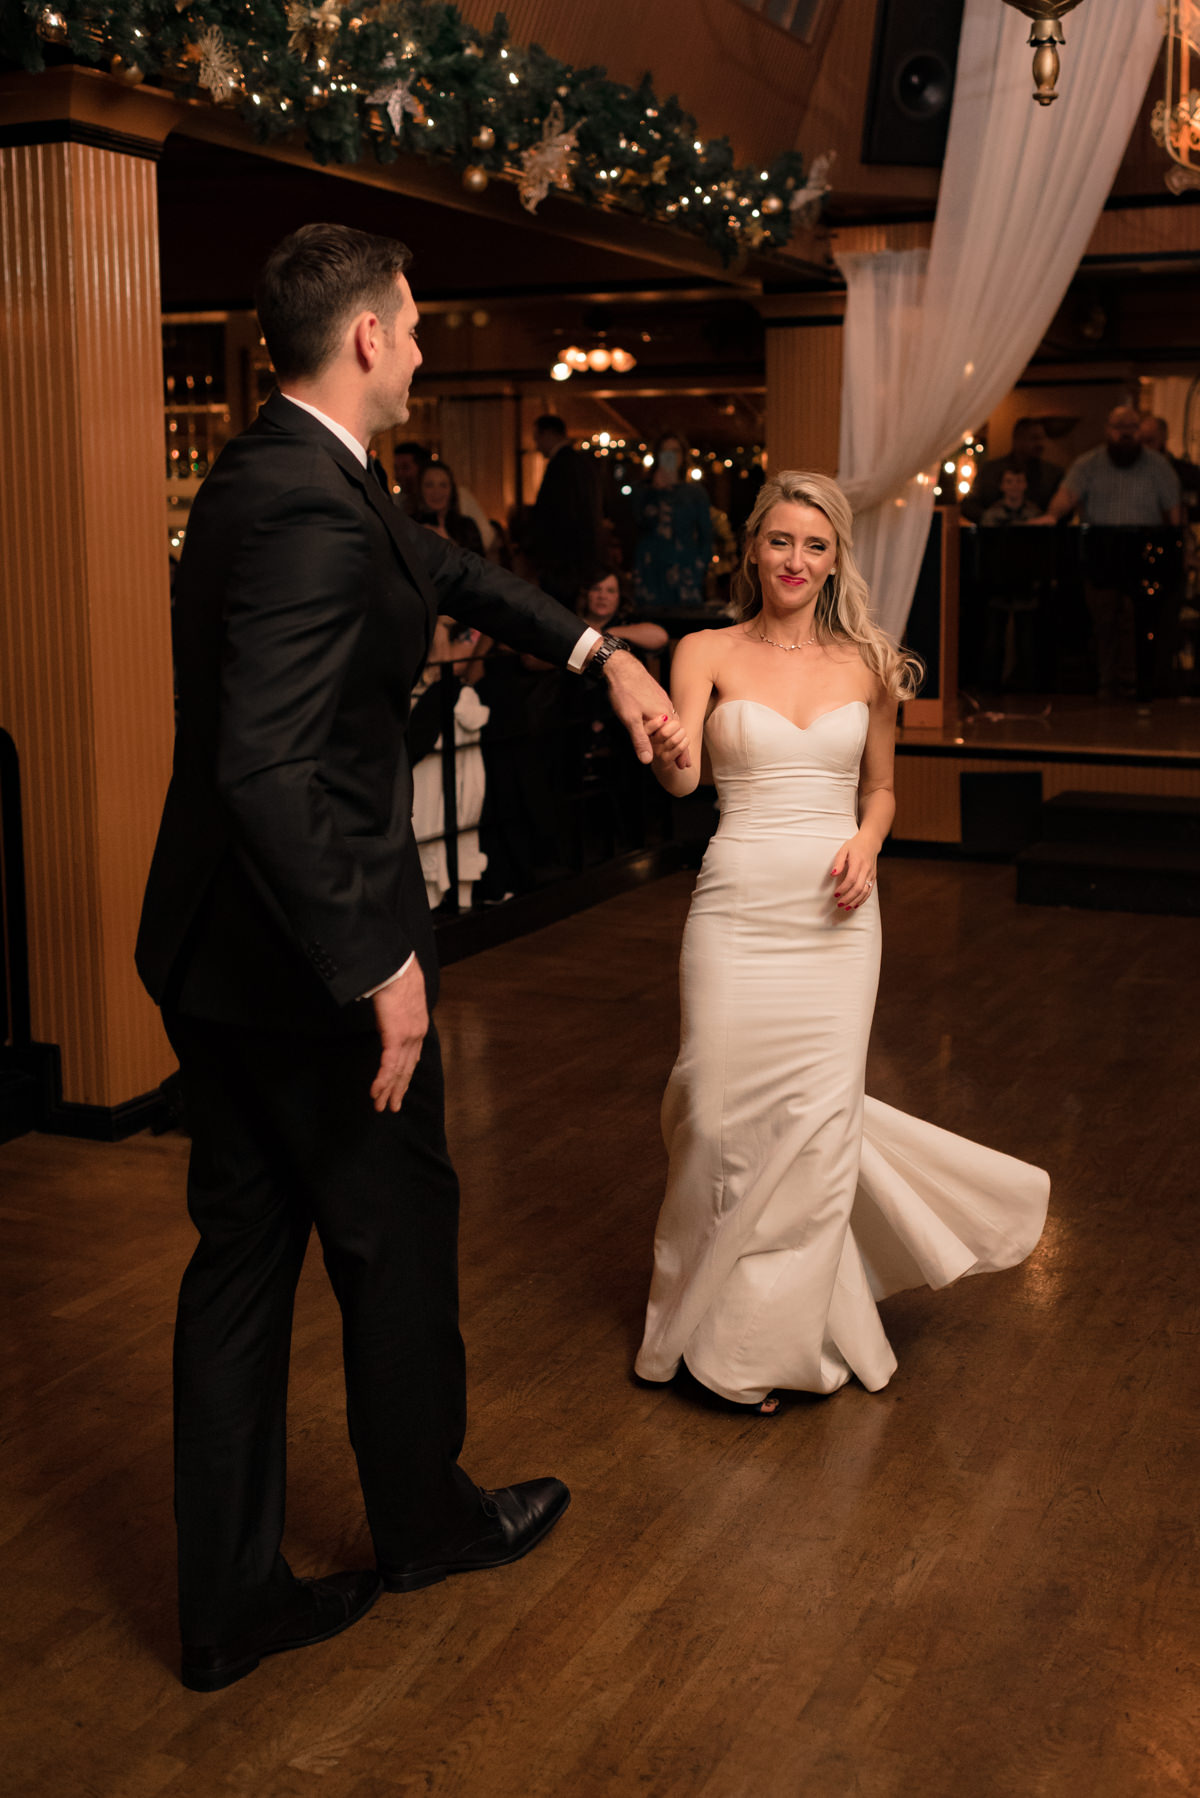 Andrew Tat - Documentary Wedding Photography - Lake Union Cafe - Seattle, Washington -Rachel and Ryan - 48.jpg